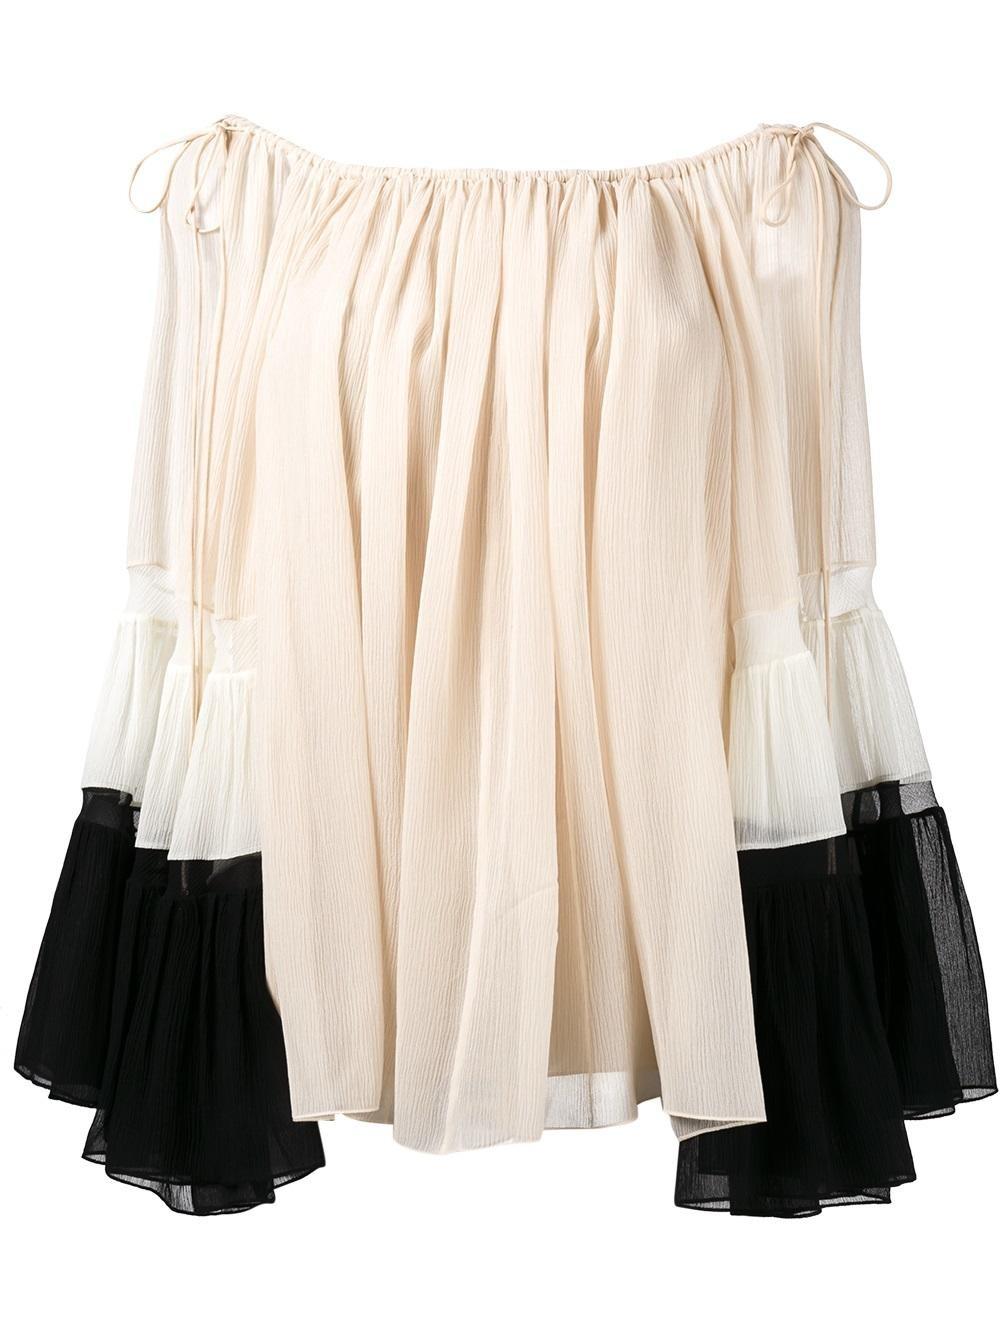 Chloé Silks draped off-shoulder blouse